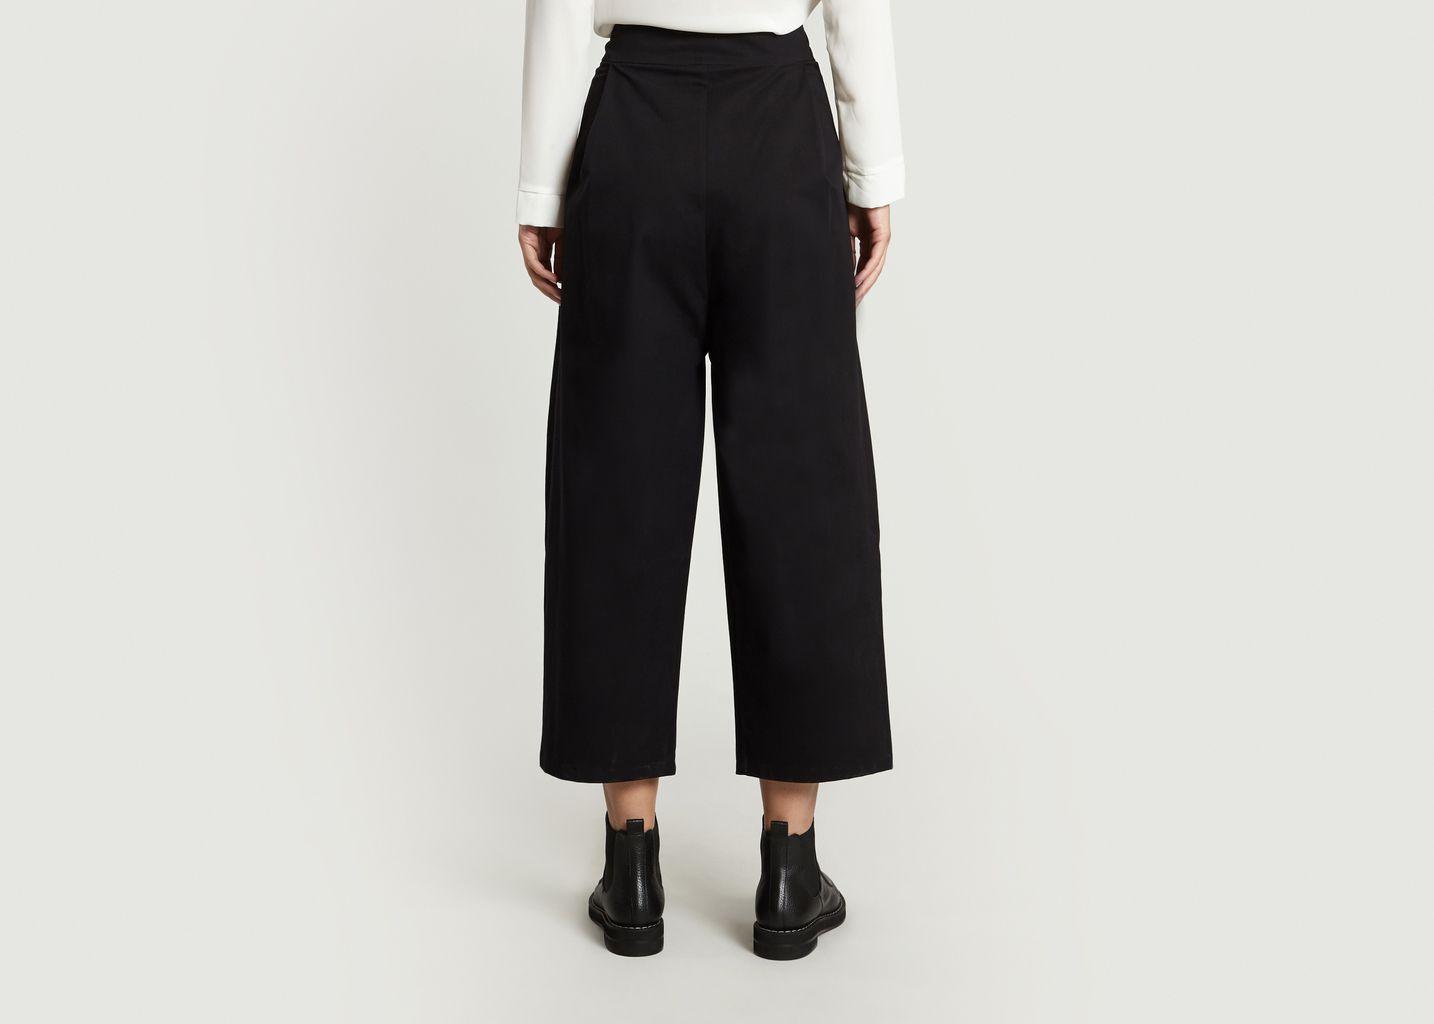 Roxane BainesL'exception BainesL'exception Noir Toshi Roxane Toshi Pantalon Pantalon Pantalon Noir Nwm0n8